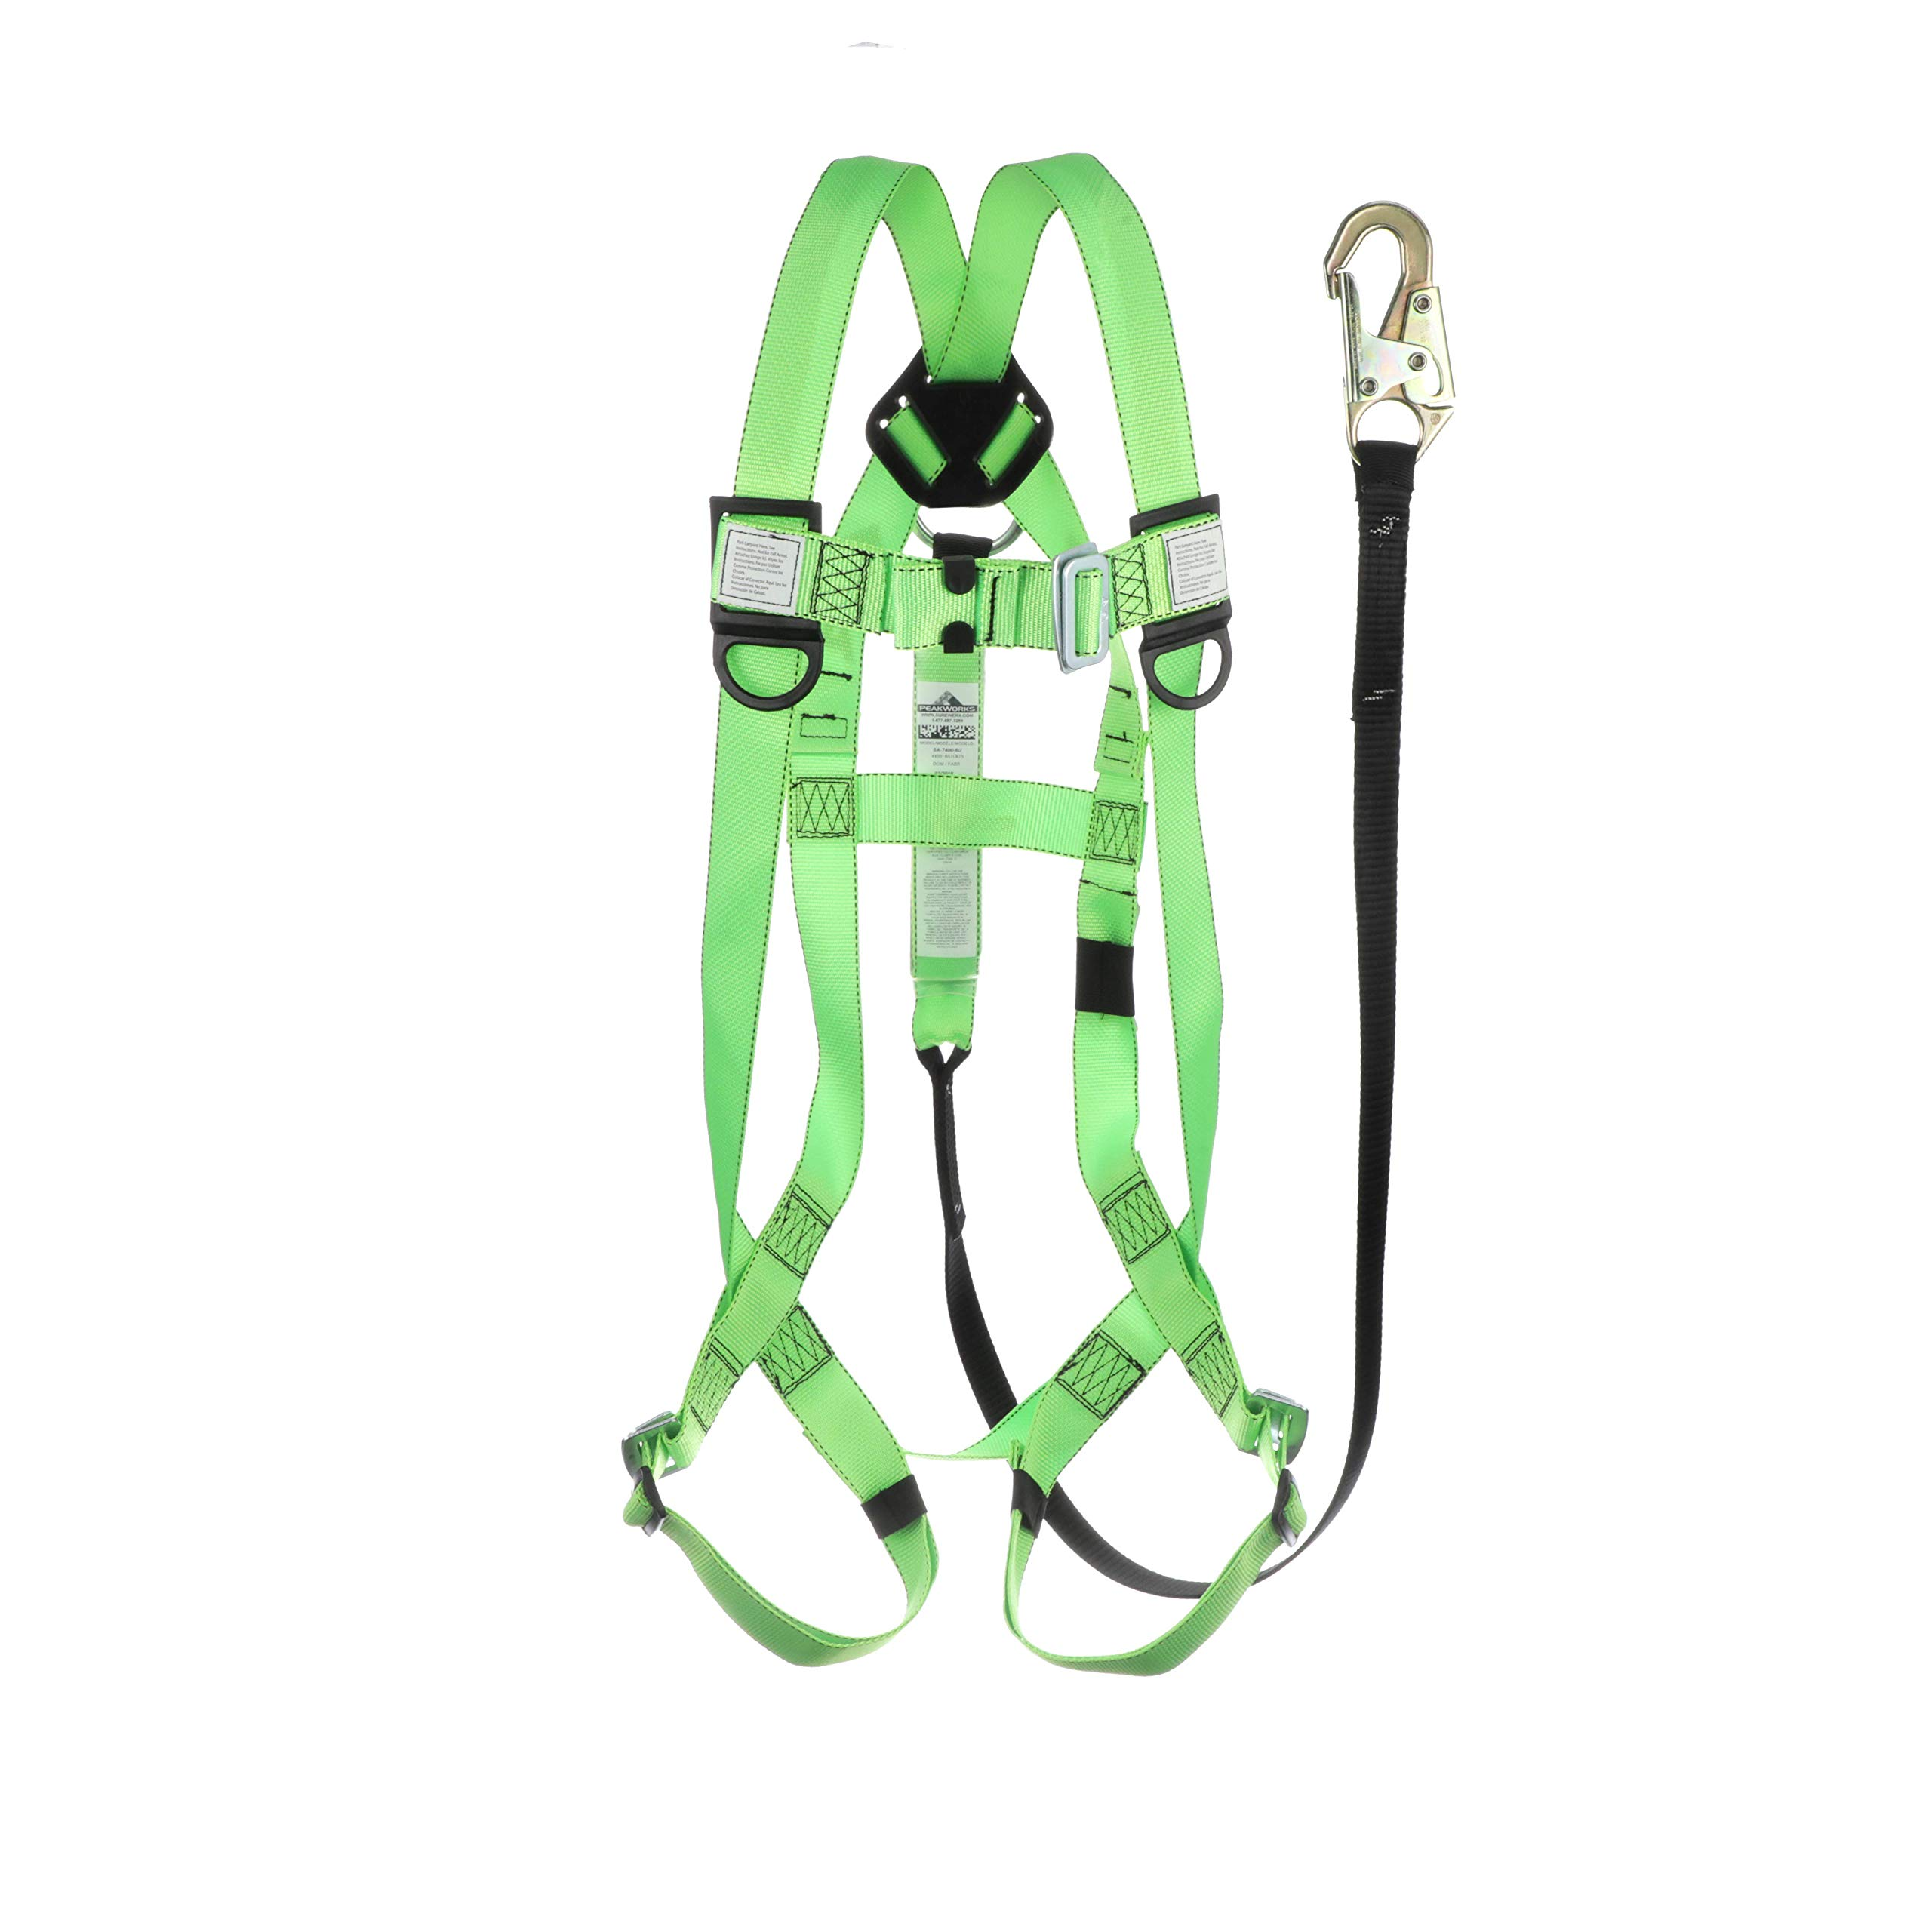 Peakworks Fall Protection V8252366 OSHA/ANSI Compliant Safety Harness and 6 ft. Lanyard Kit by Peakworks